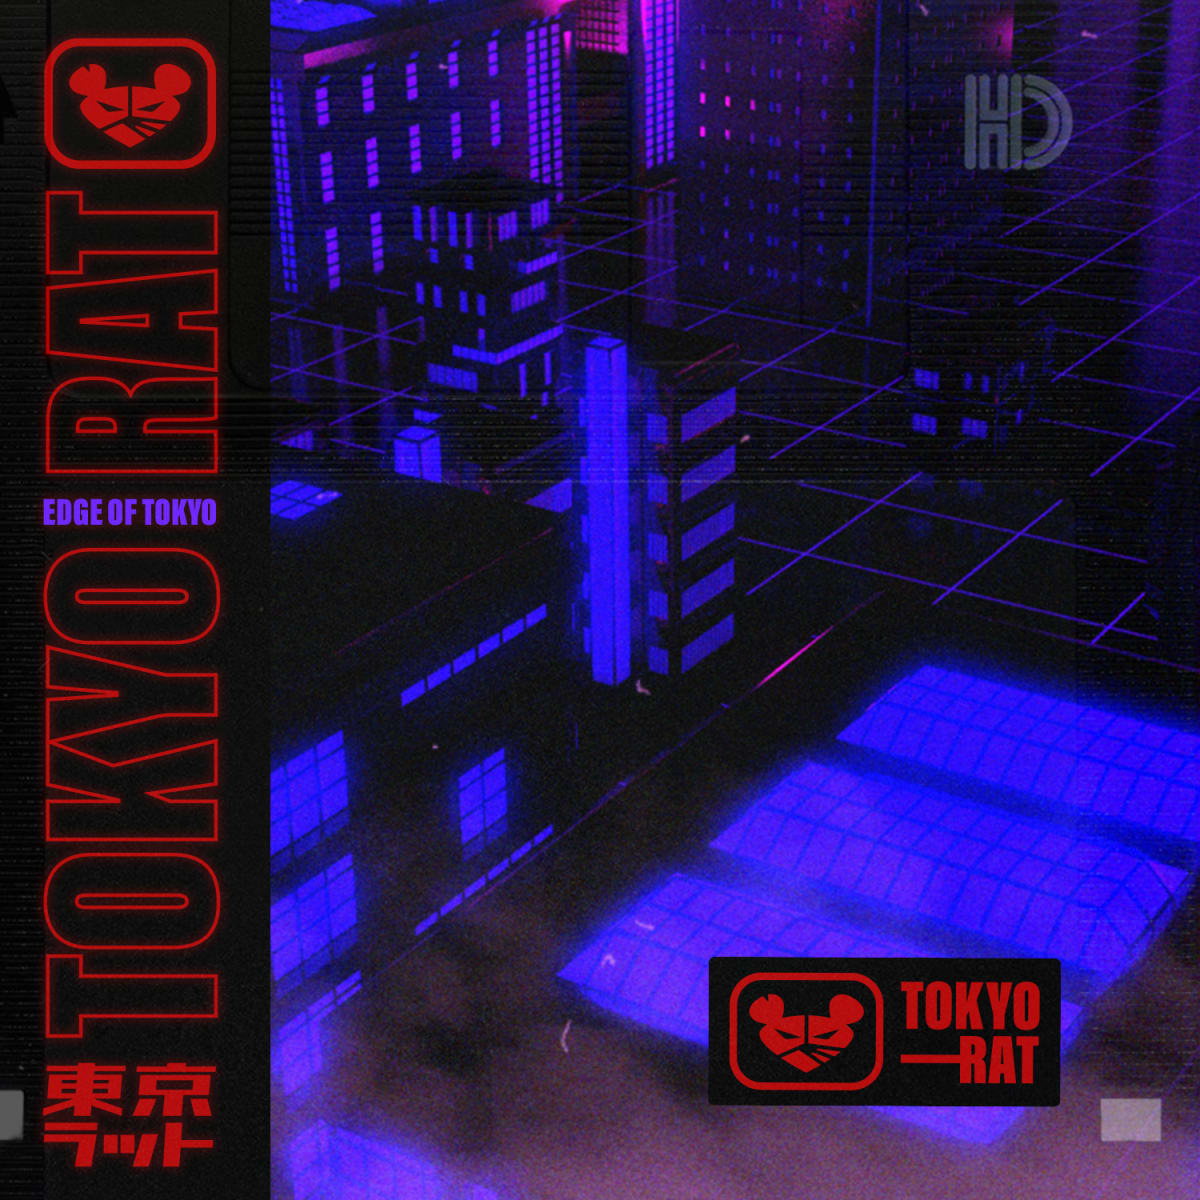 "Tokyo Rat Preps for Album with Futuristic New Single ""Edge of Tokyo"" - EDM.com"